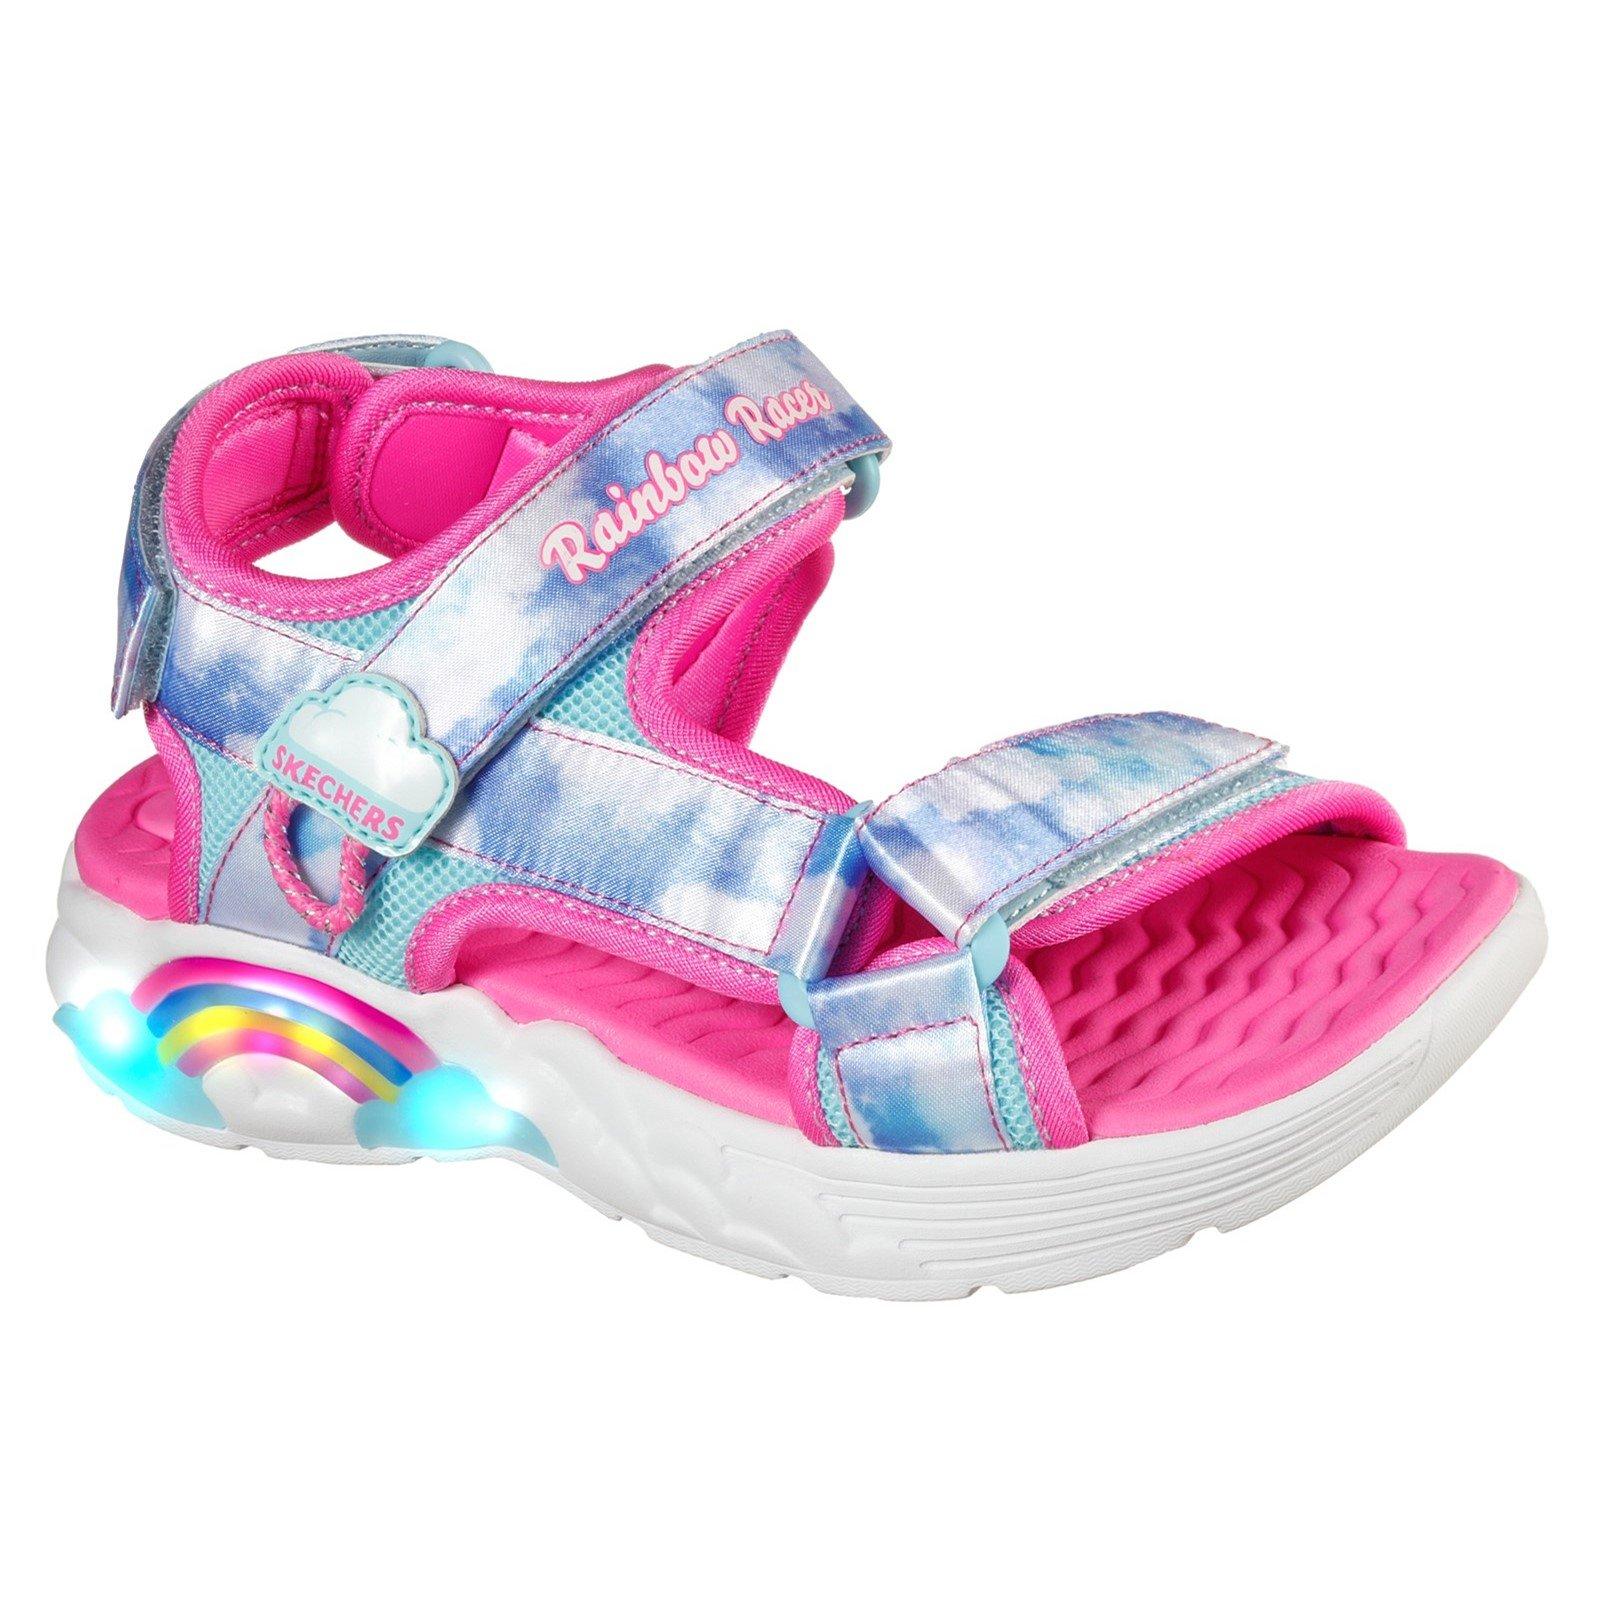 Skechers Unisex Rainbow Racer Summer Sky Beach Sandals Multicolor 32096 - Pink/Blue Textile 13